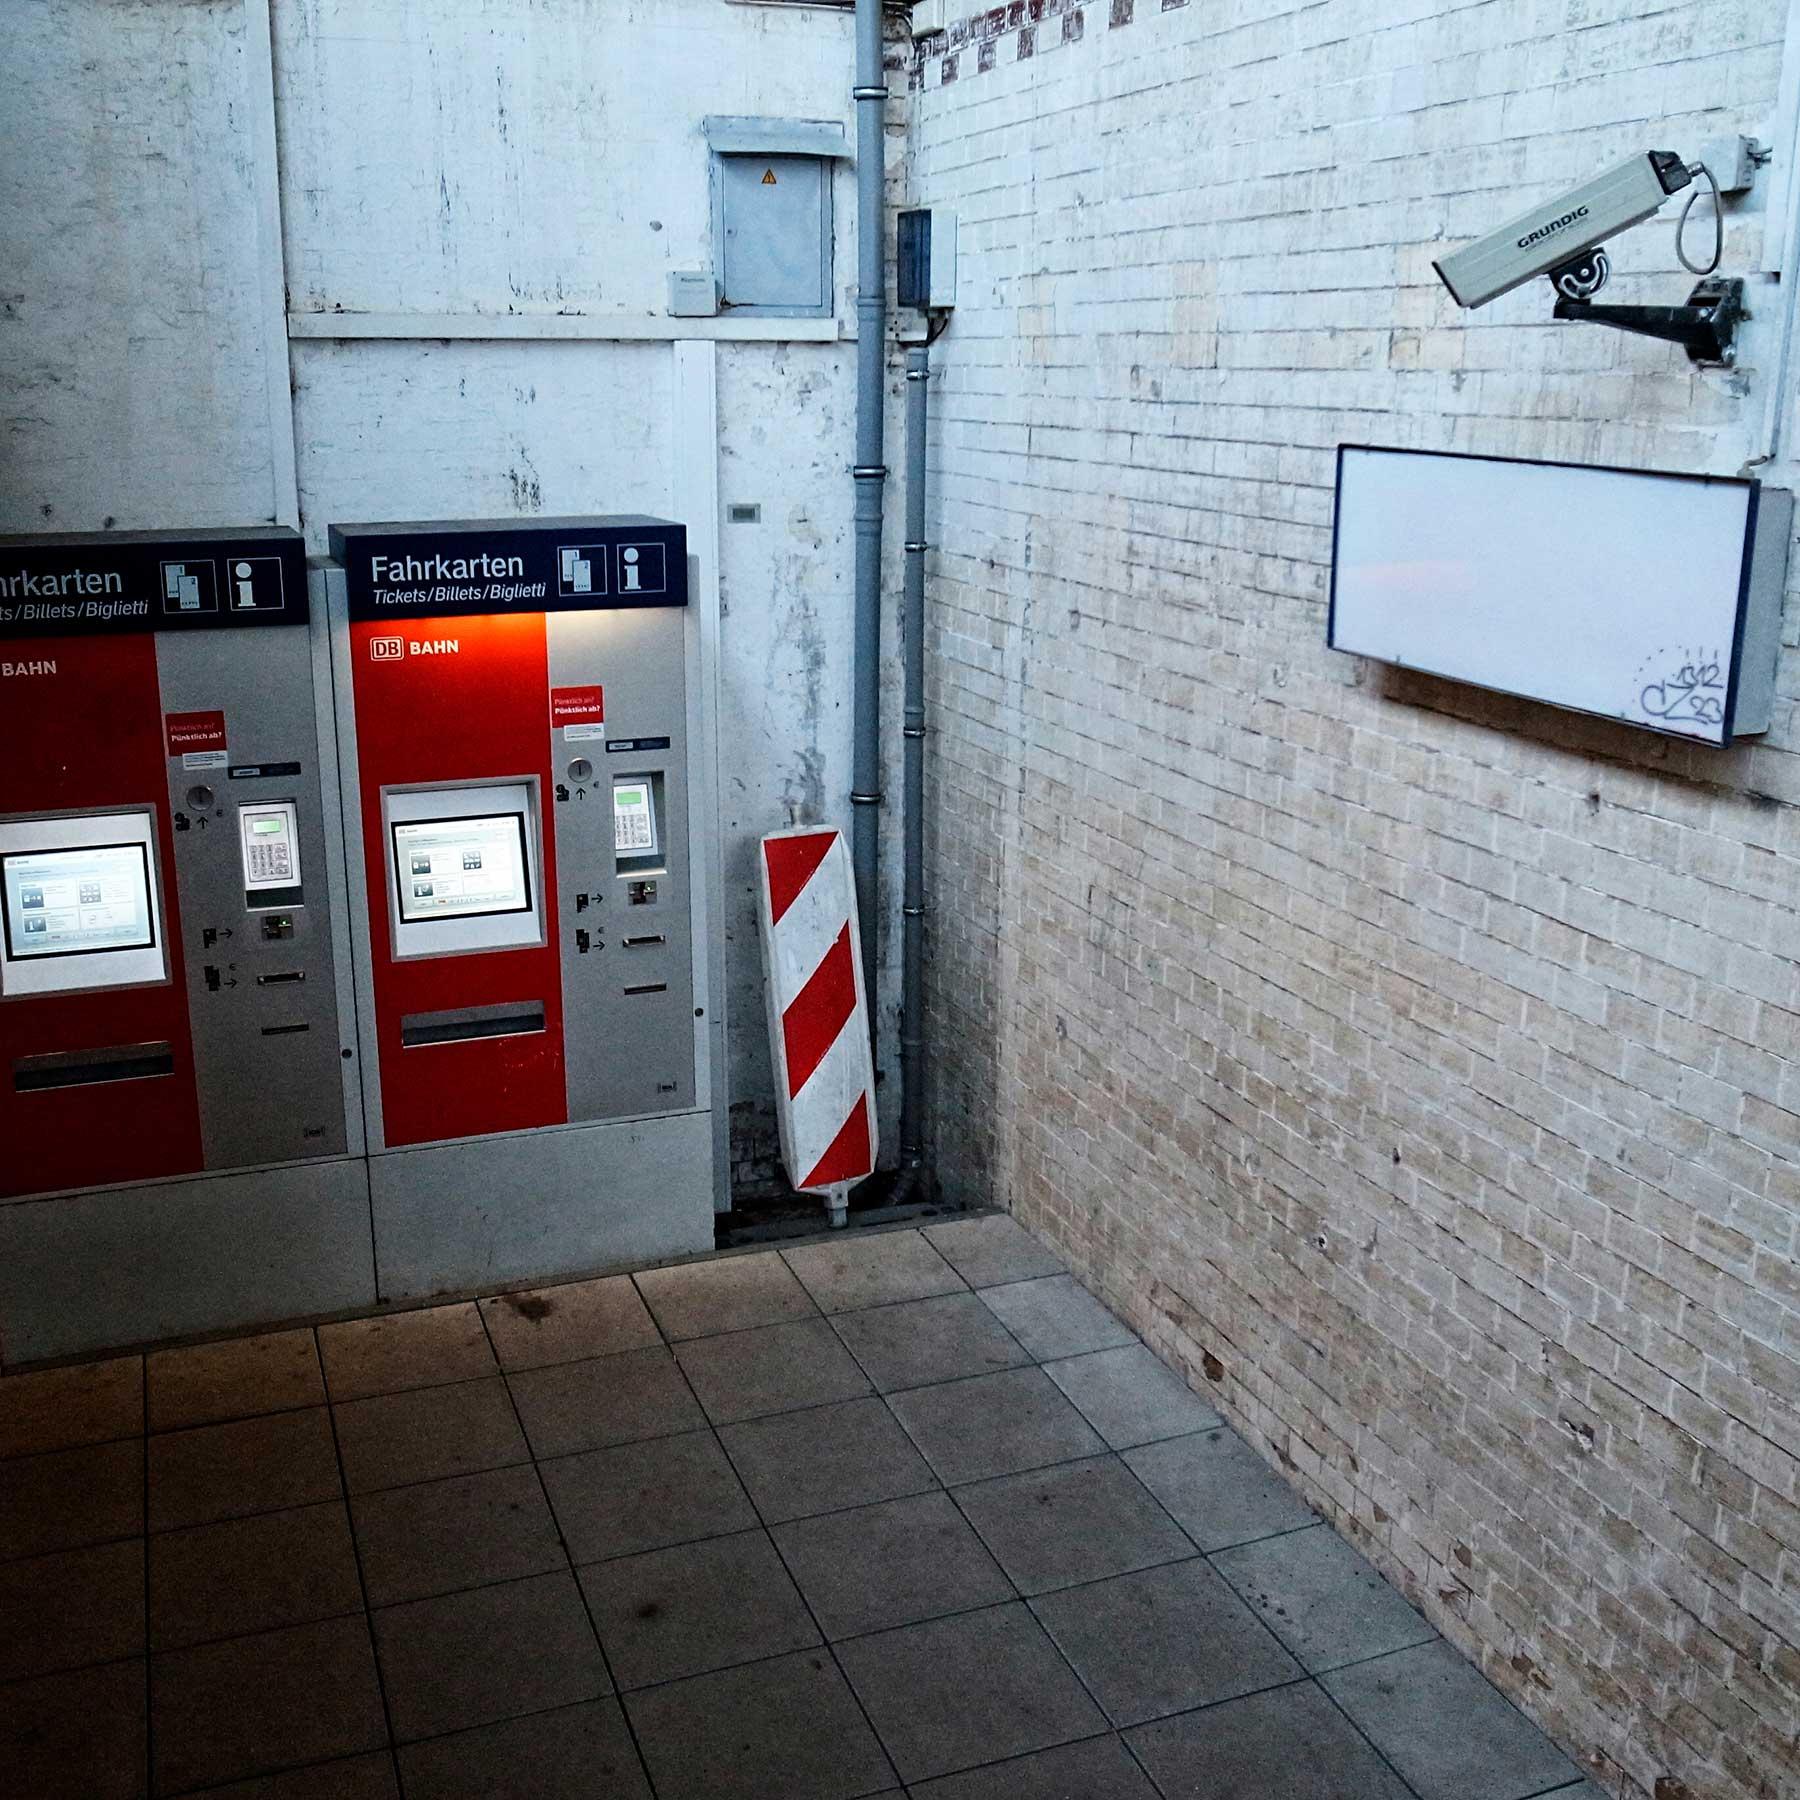 Surveillance and ticket machines at the Hoyerswerda train Station.